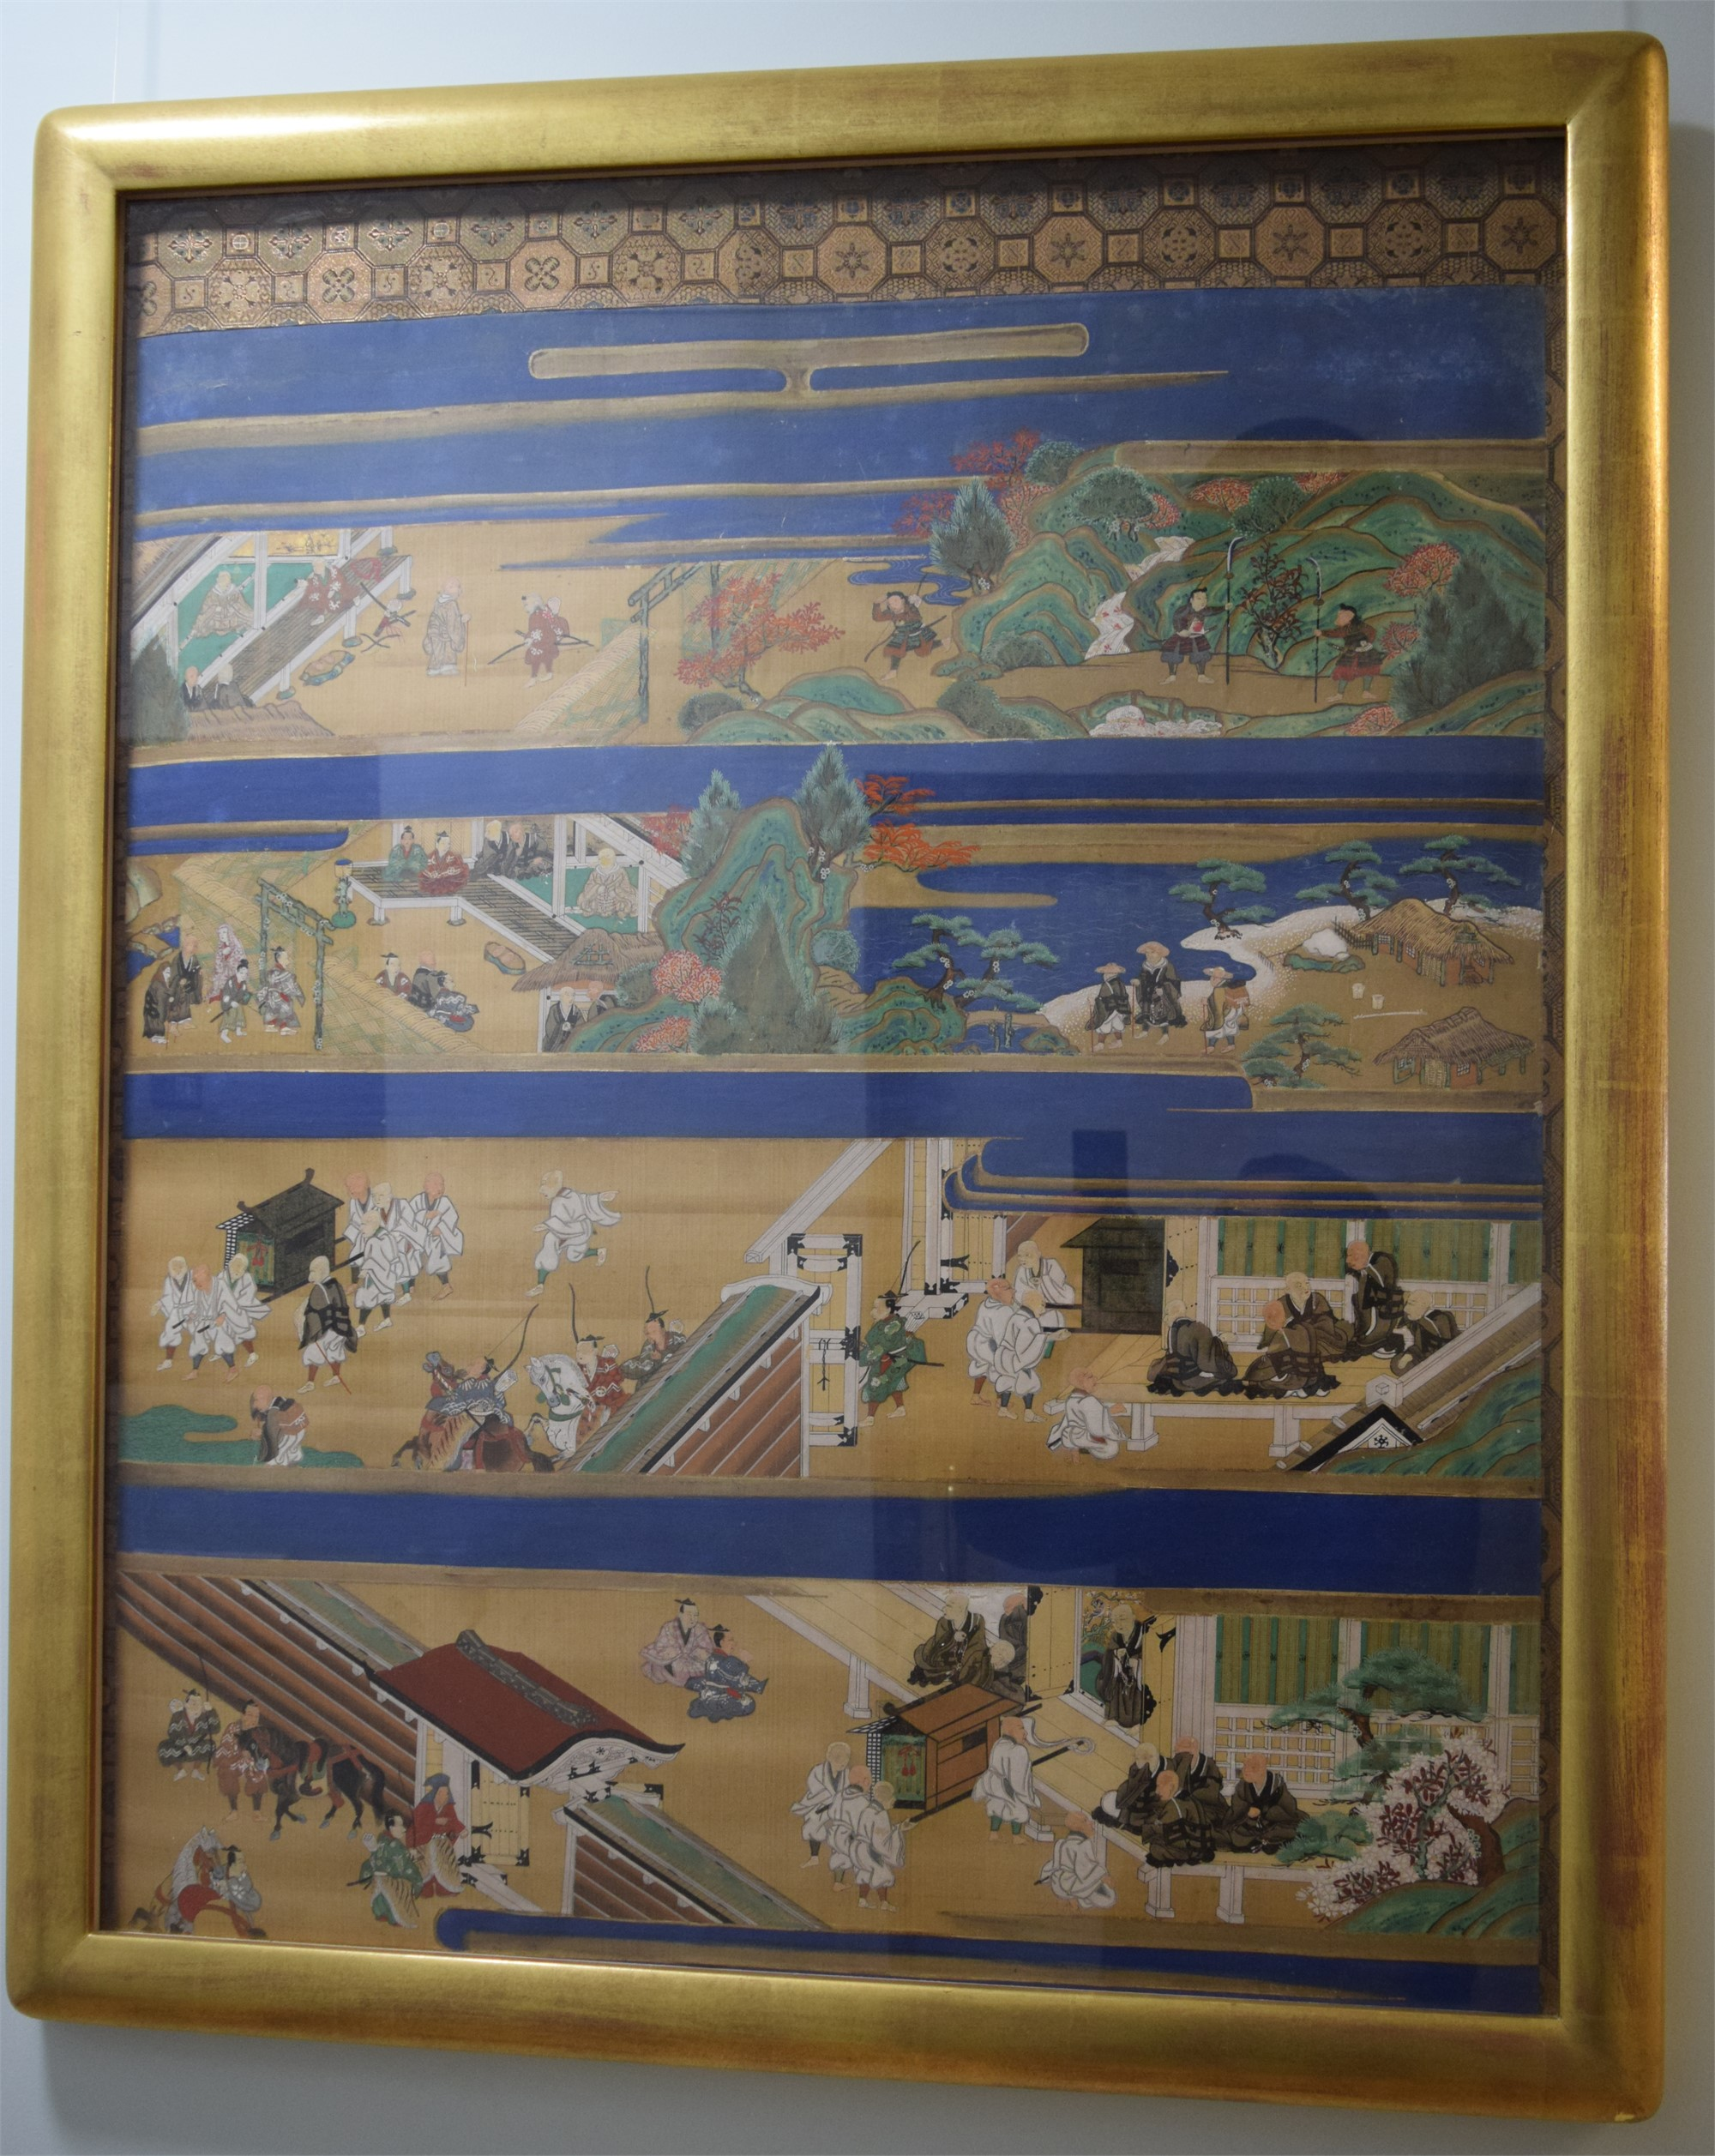 JAPANESE HANGING SCROLL ON SILK OF LIFE OF SAINT SHINRAN